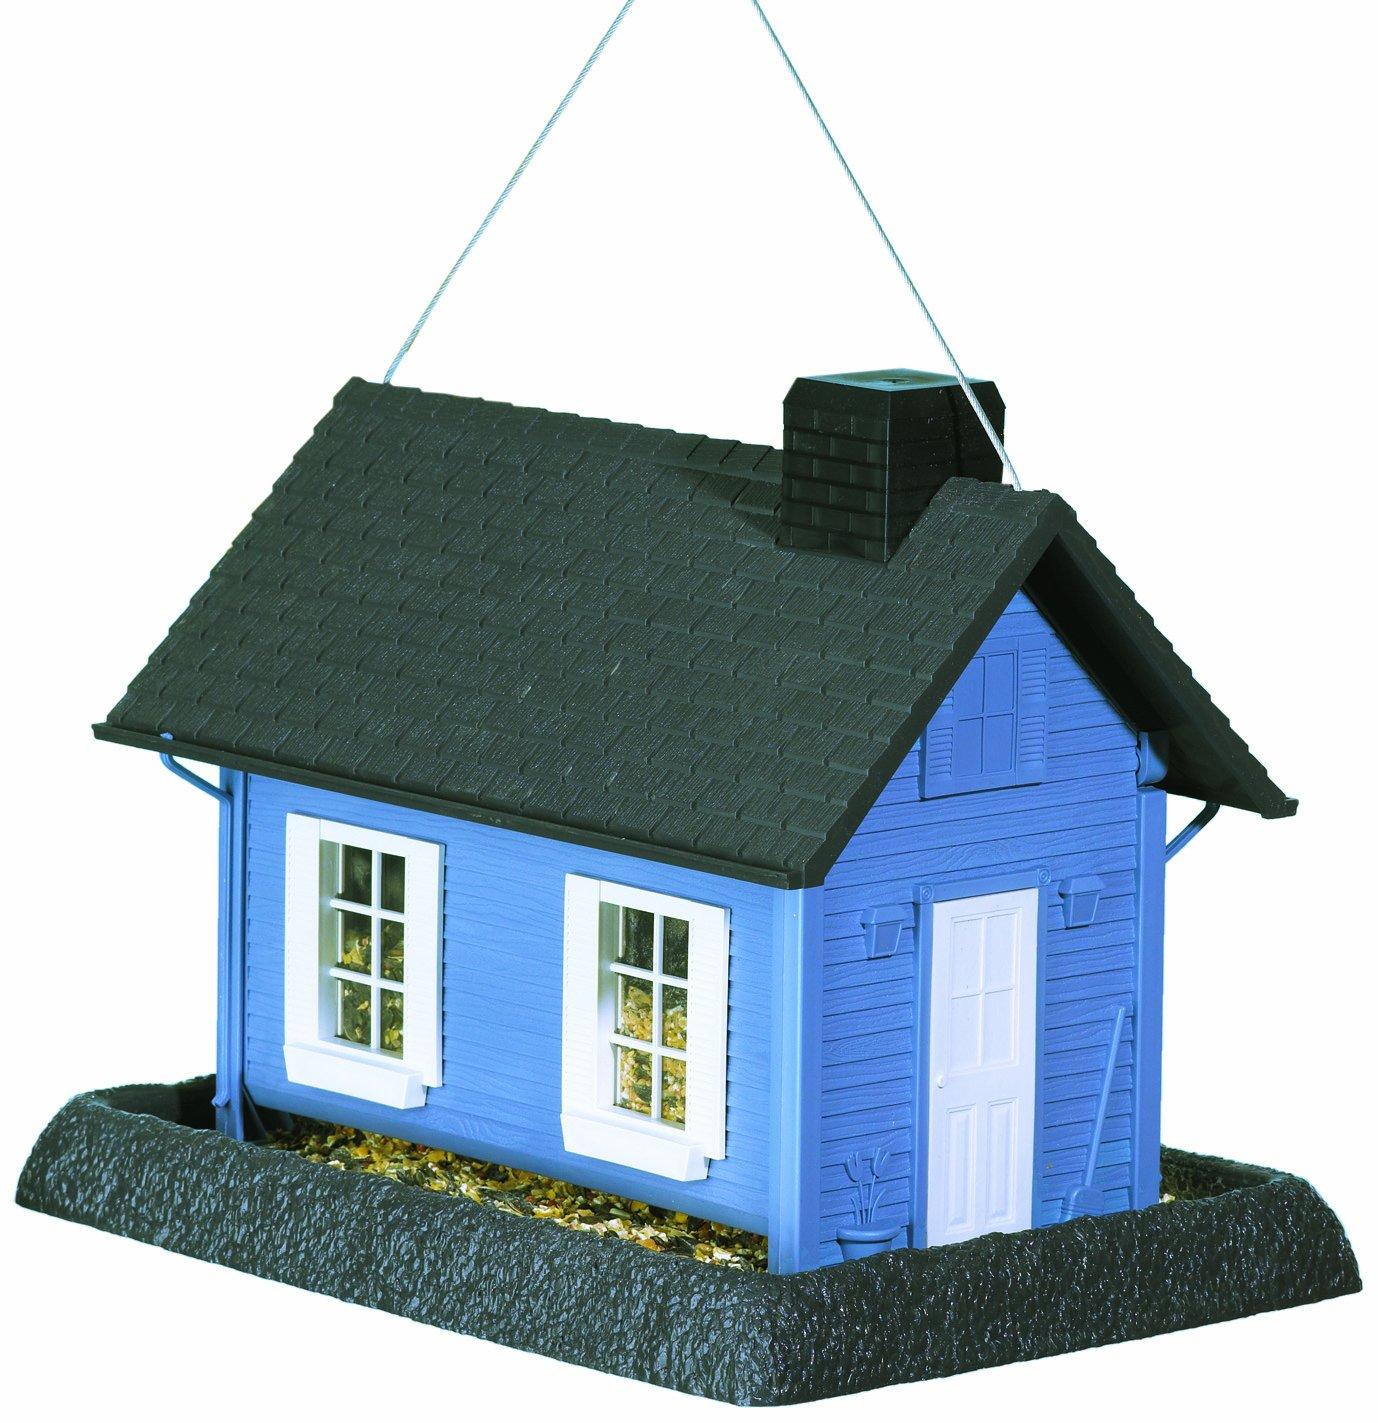 North States Village Collection Grand Style Birdfeeder-Large Blue Cottage, Gray/Blue 9065M